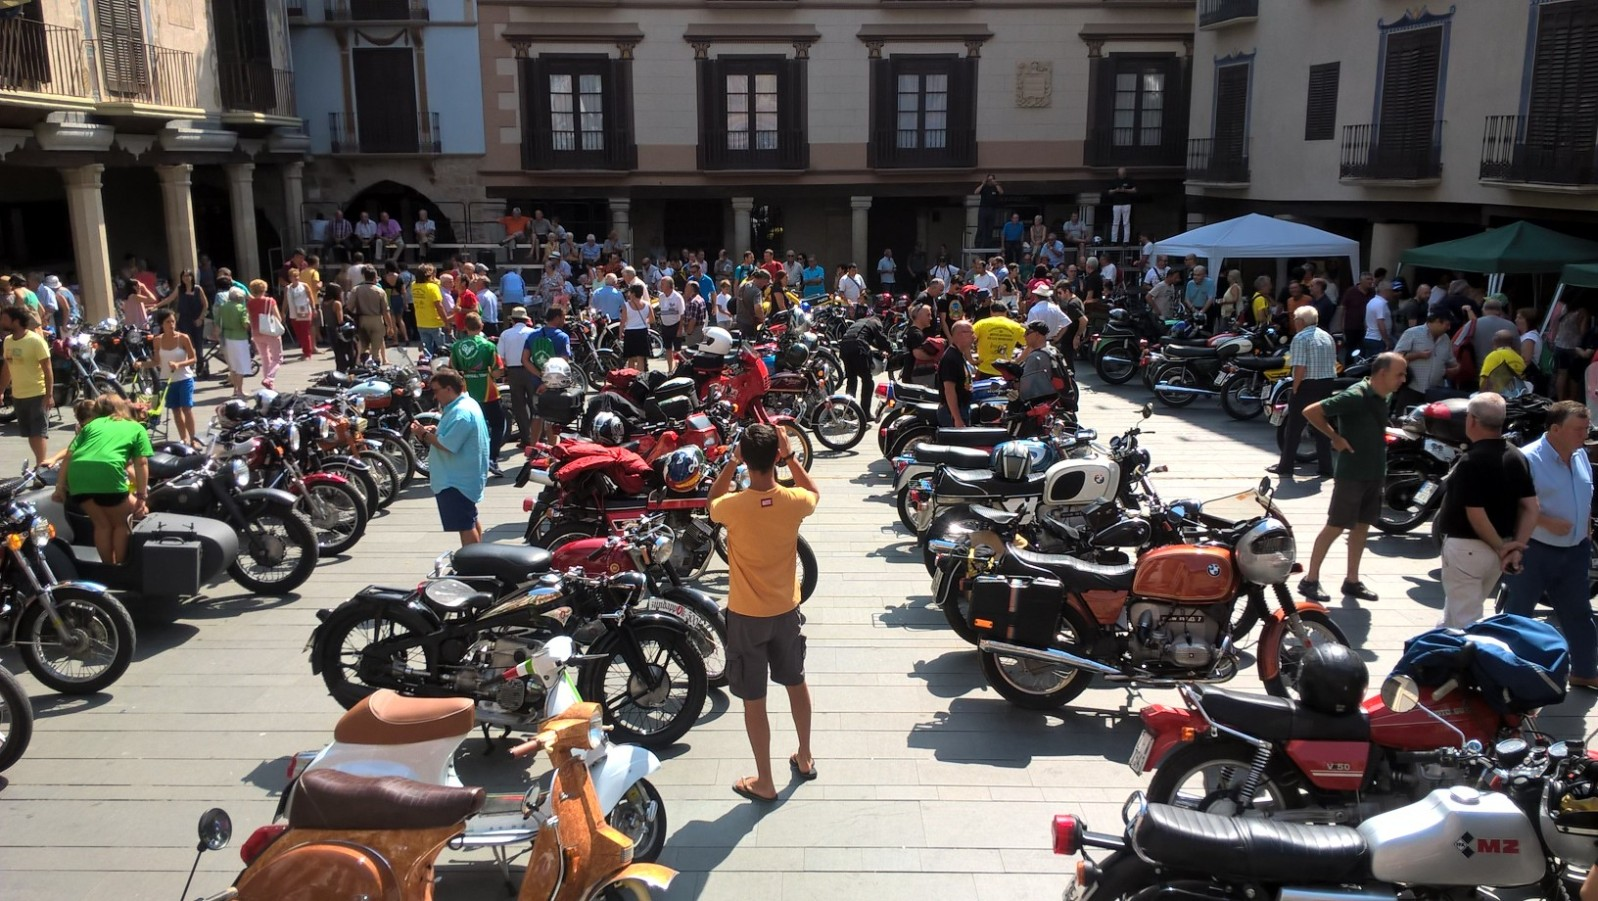 XI concentracion de motos antiguas en Alberuela de tubo (Huesca) 35i7sdl